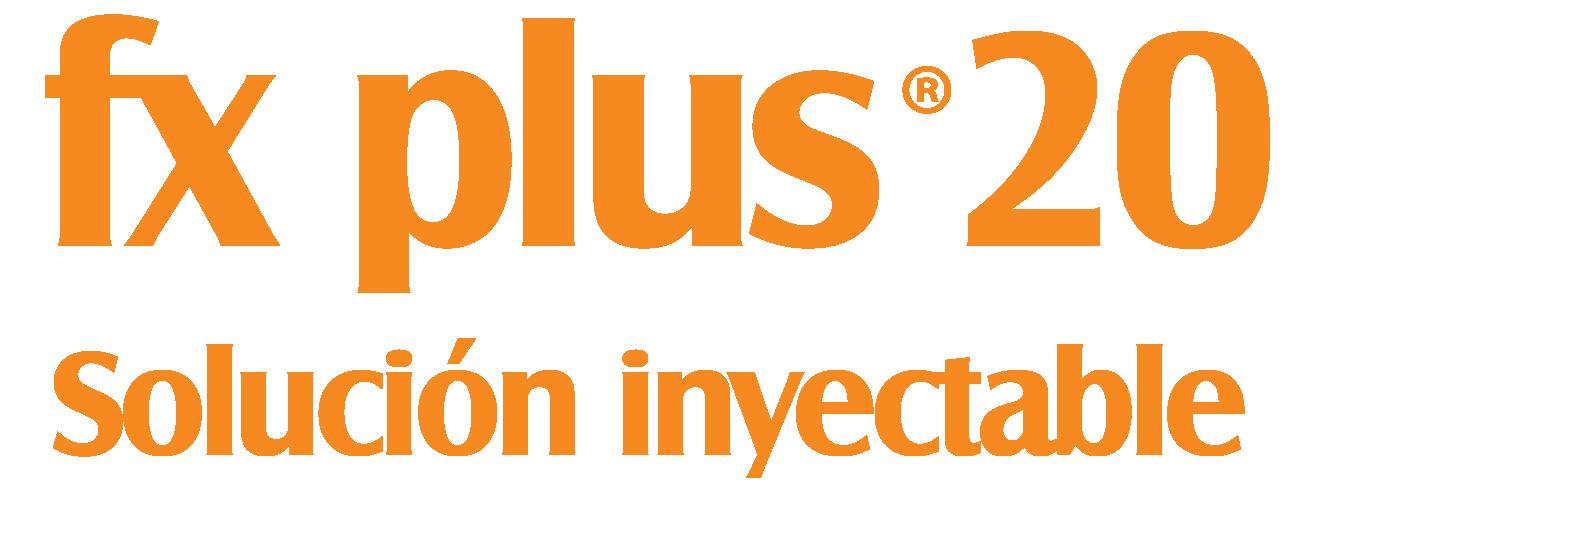 fx plus® 20 solución inyectable